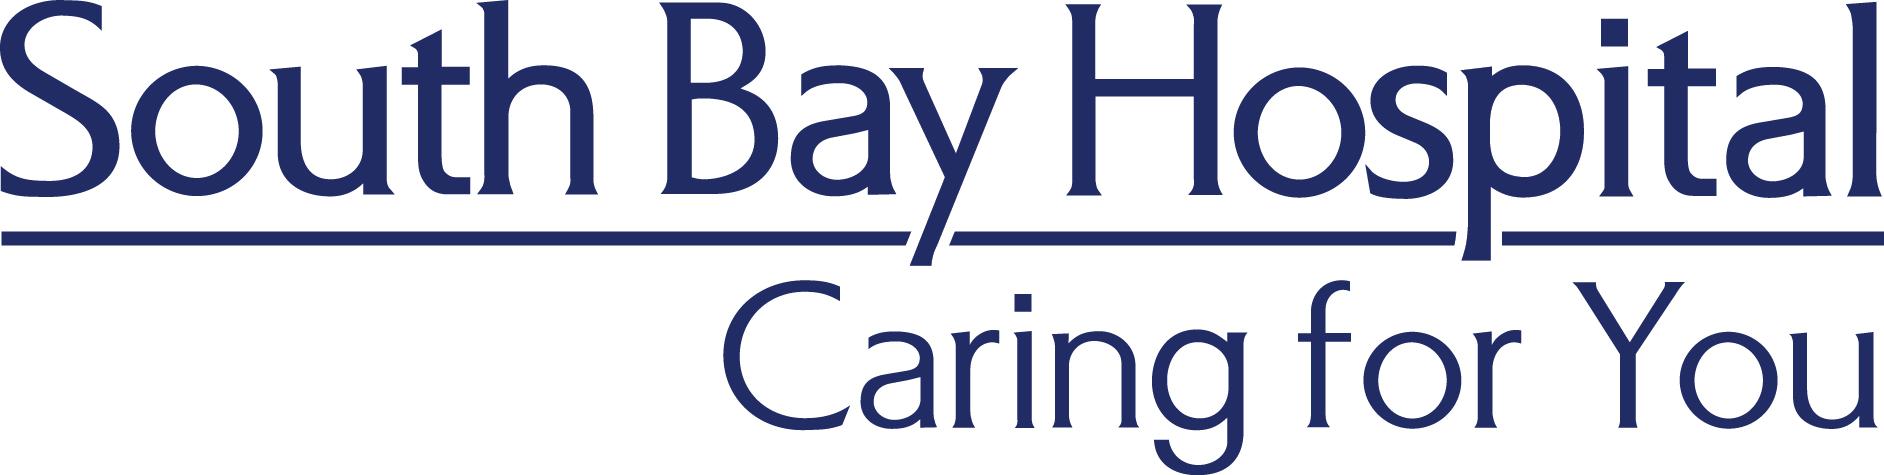 South_Bay_Hospital.jpg